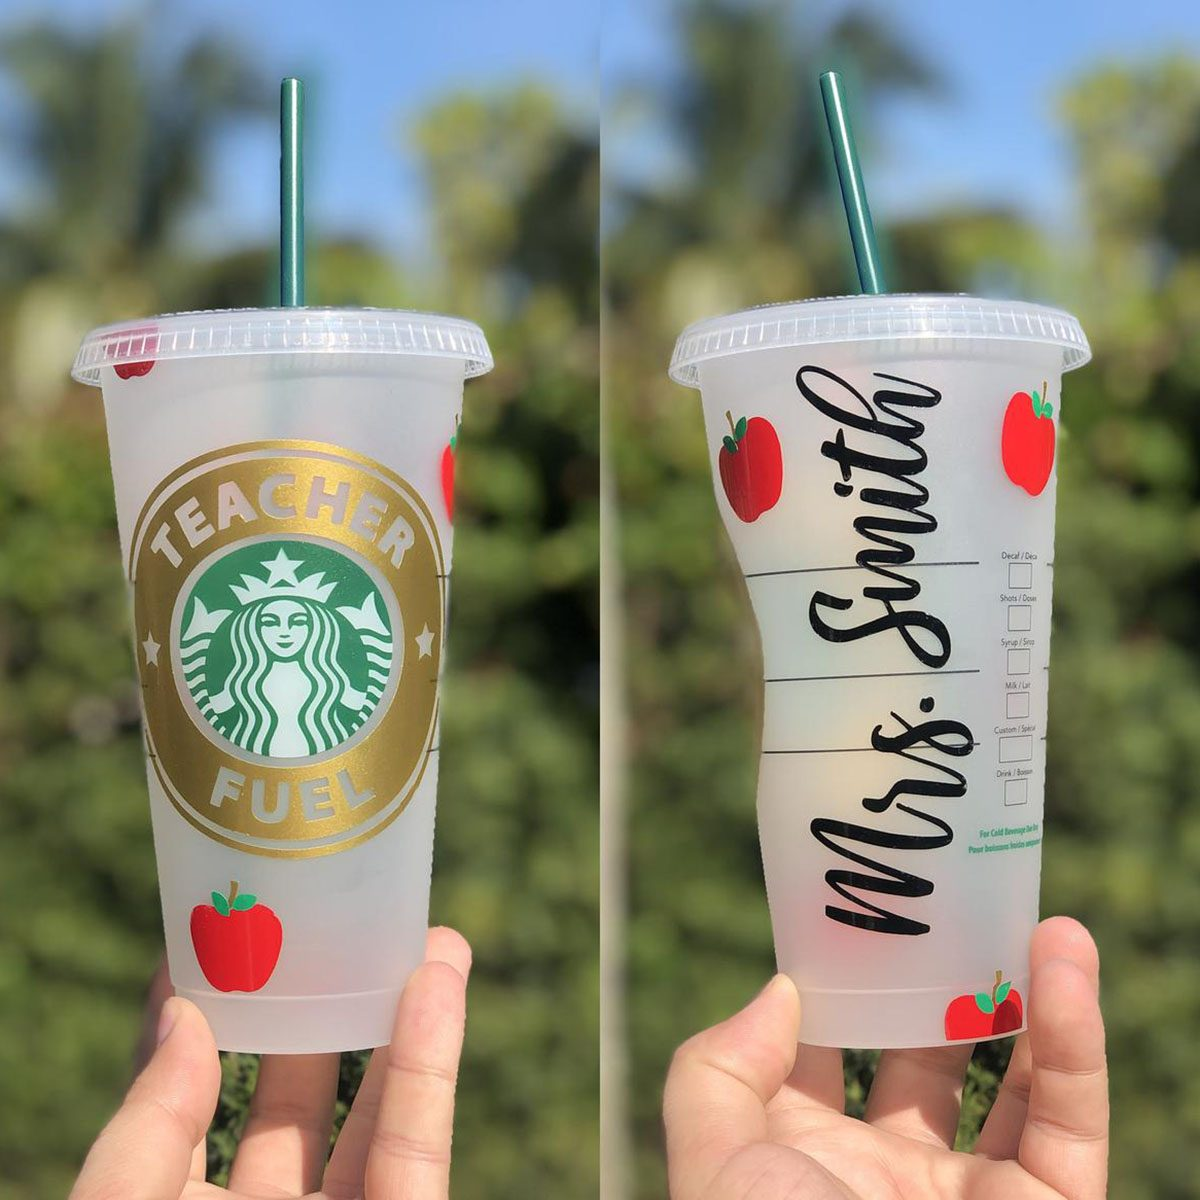 Teacher Gift Customized Reusable Starbucks Venti Cup! Teacher appreciation